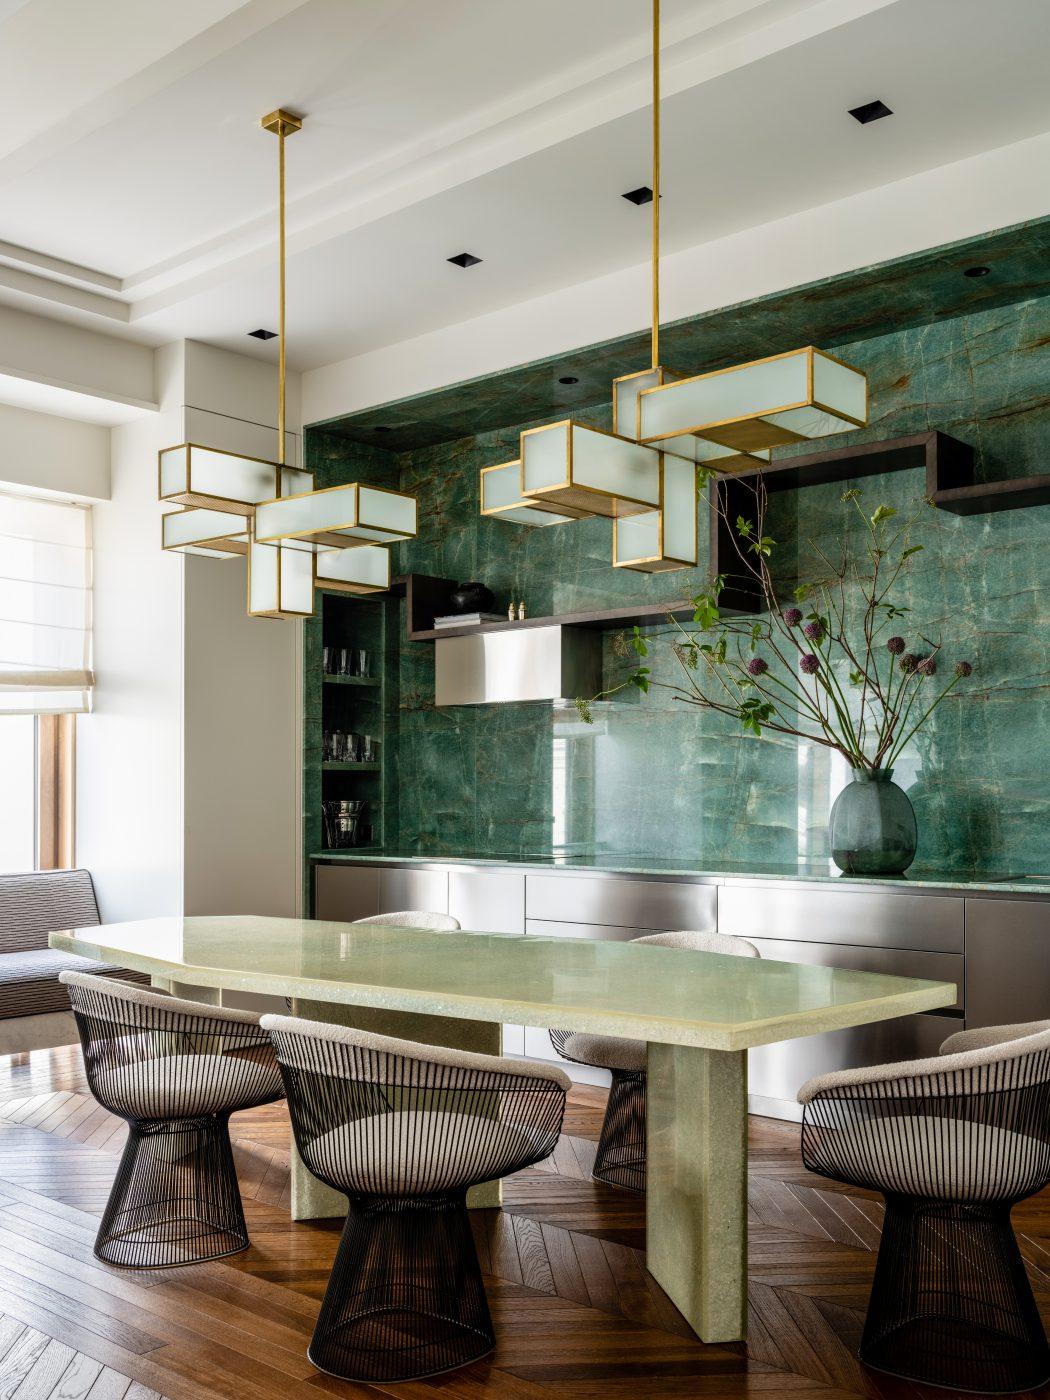 Dining room designed by Malyeva